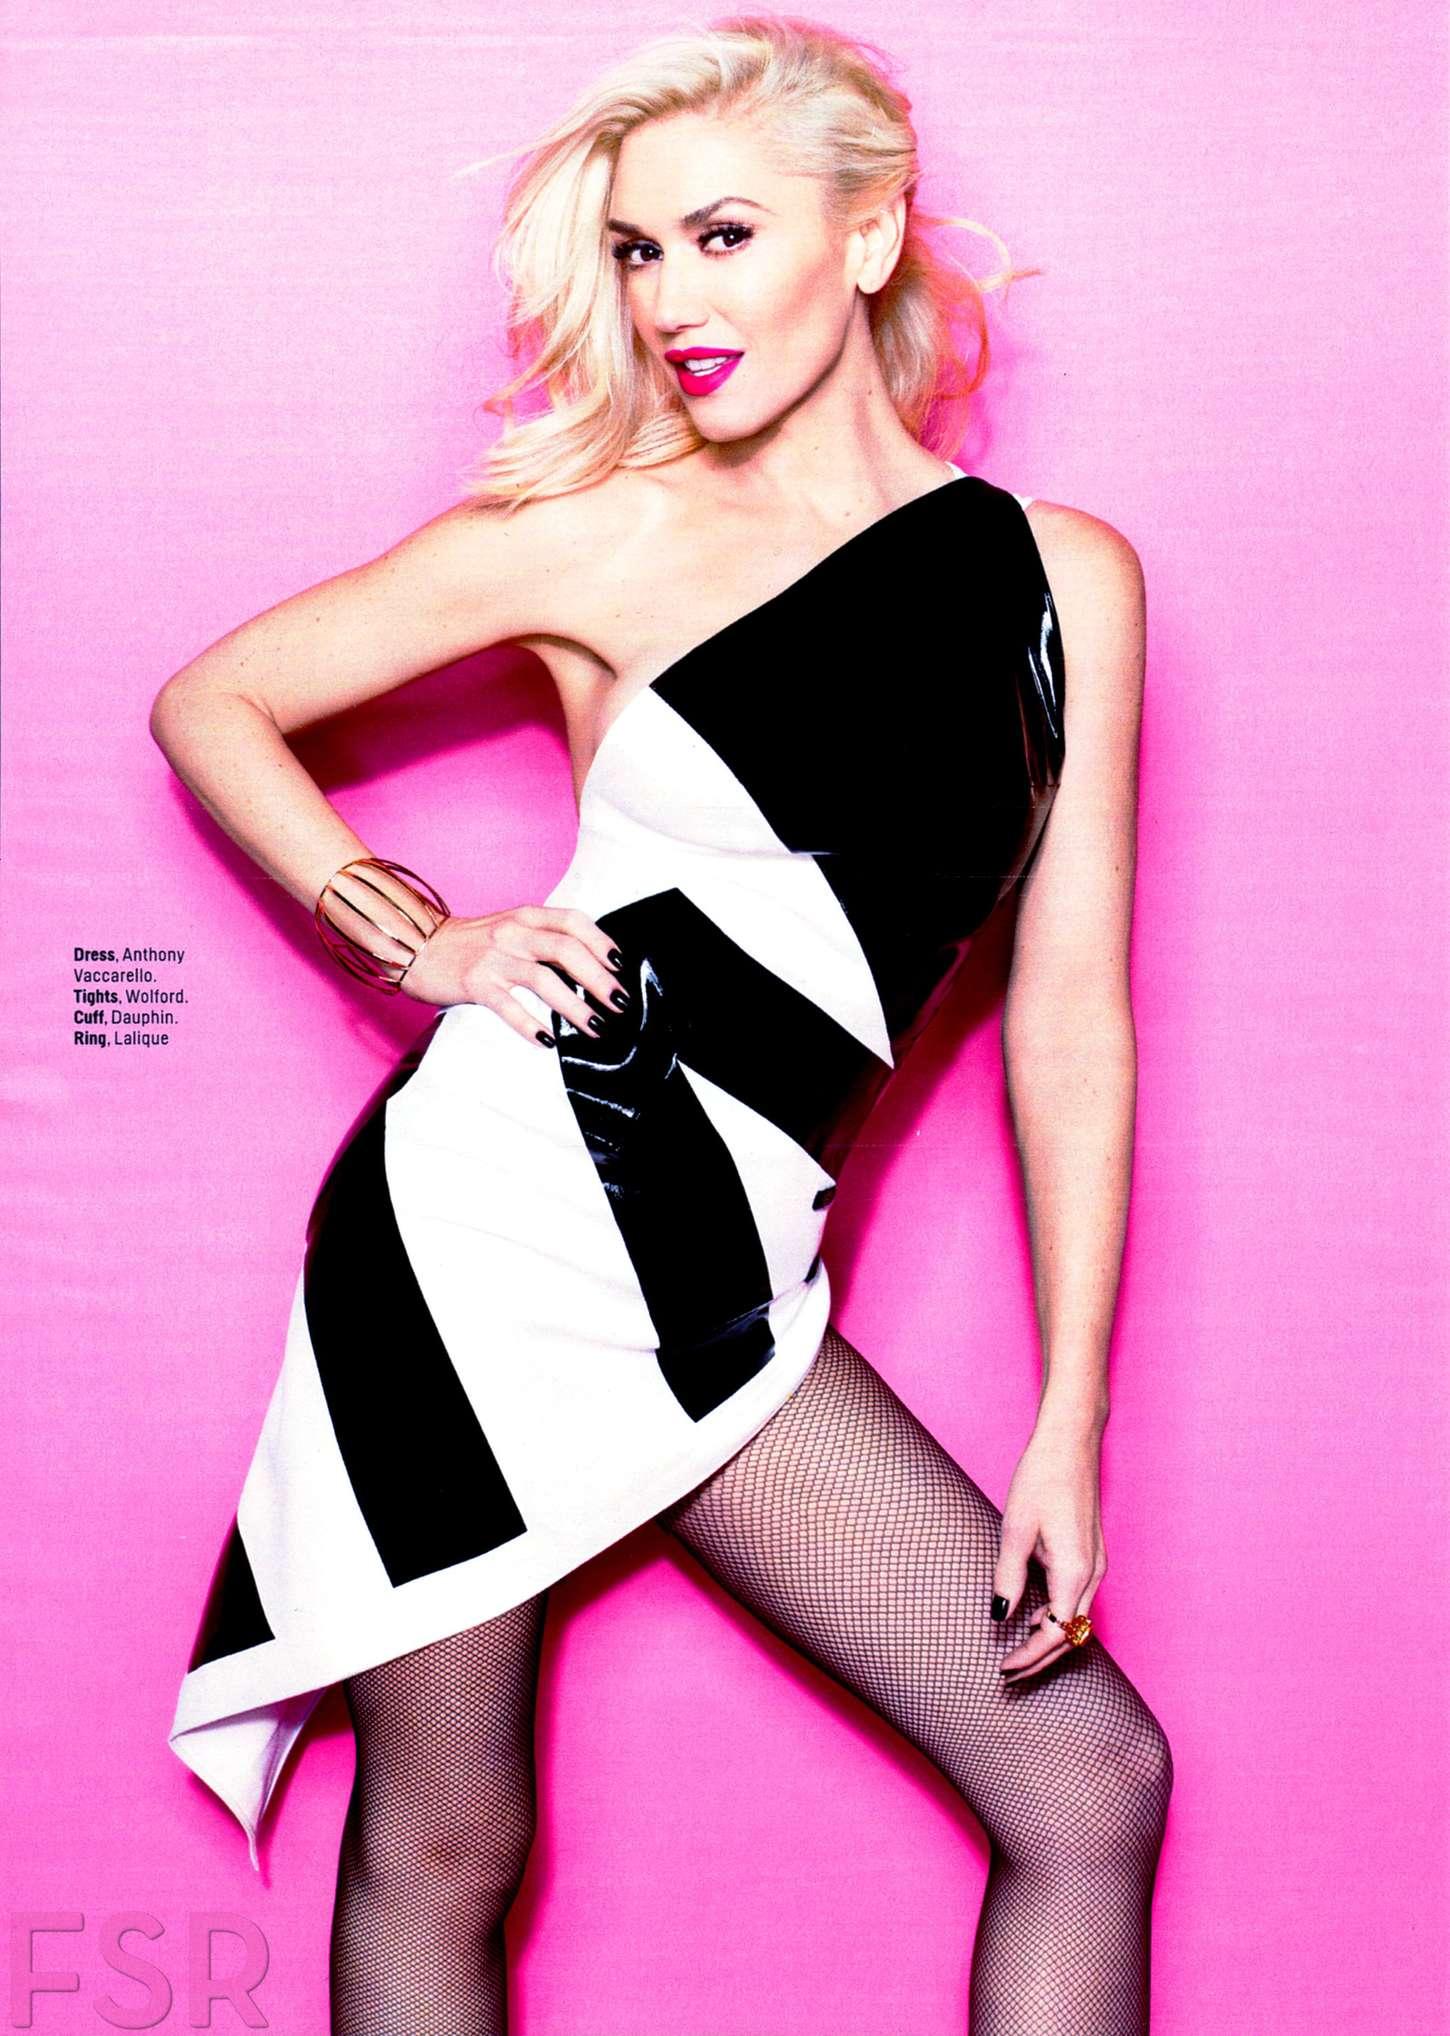 Cute Babies With Pink Dress Wallpapers Gwen Stefani Cosmopolitan Magazine March 2015 Gotceleb